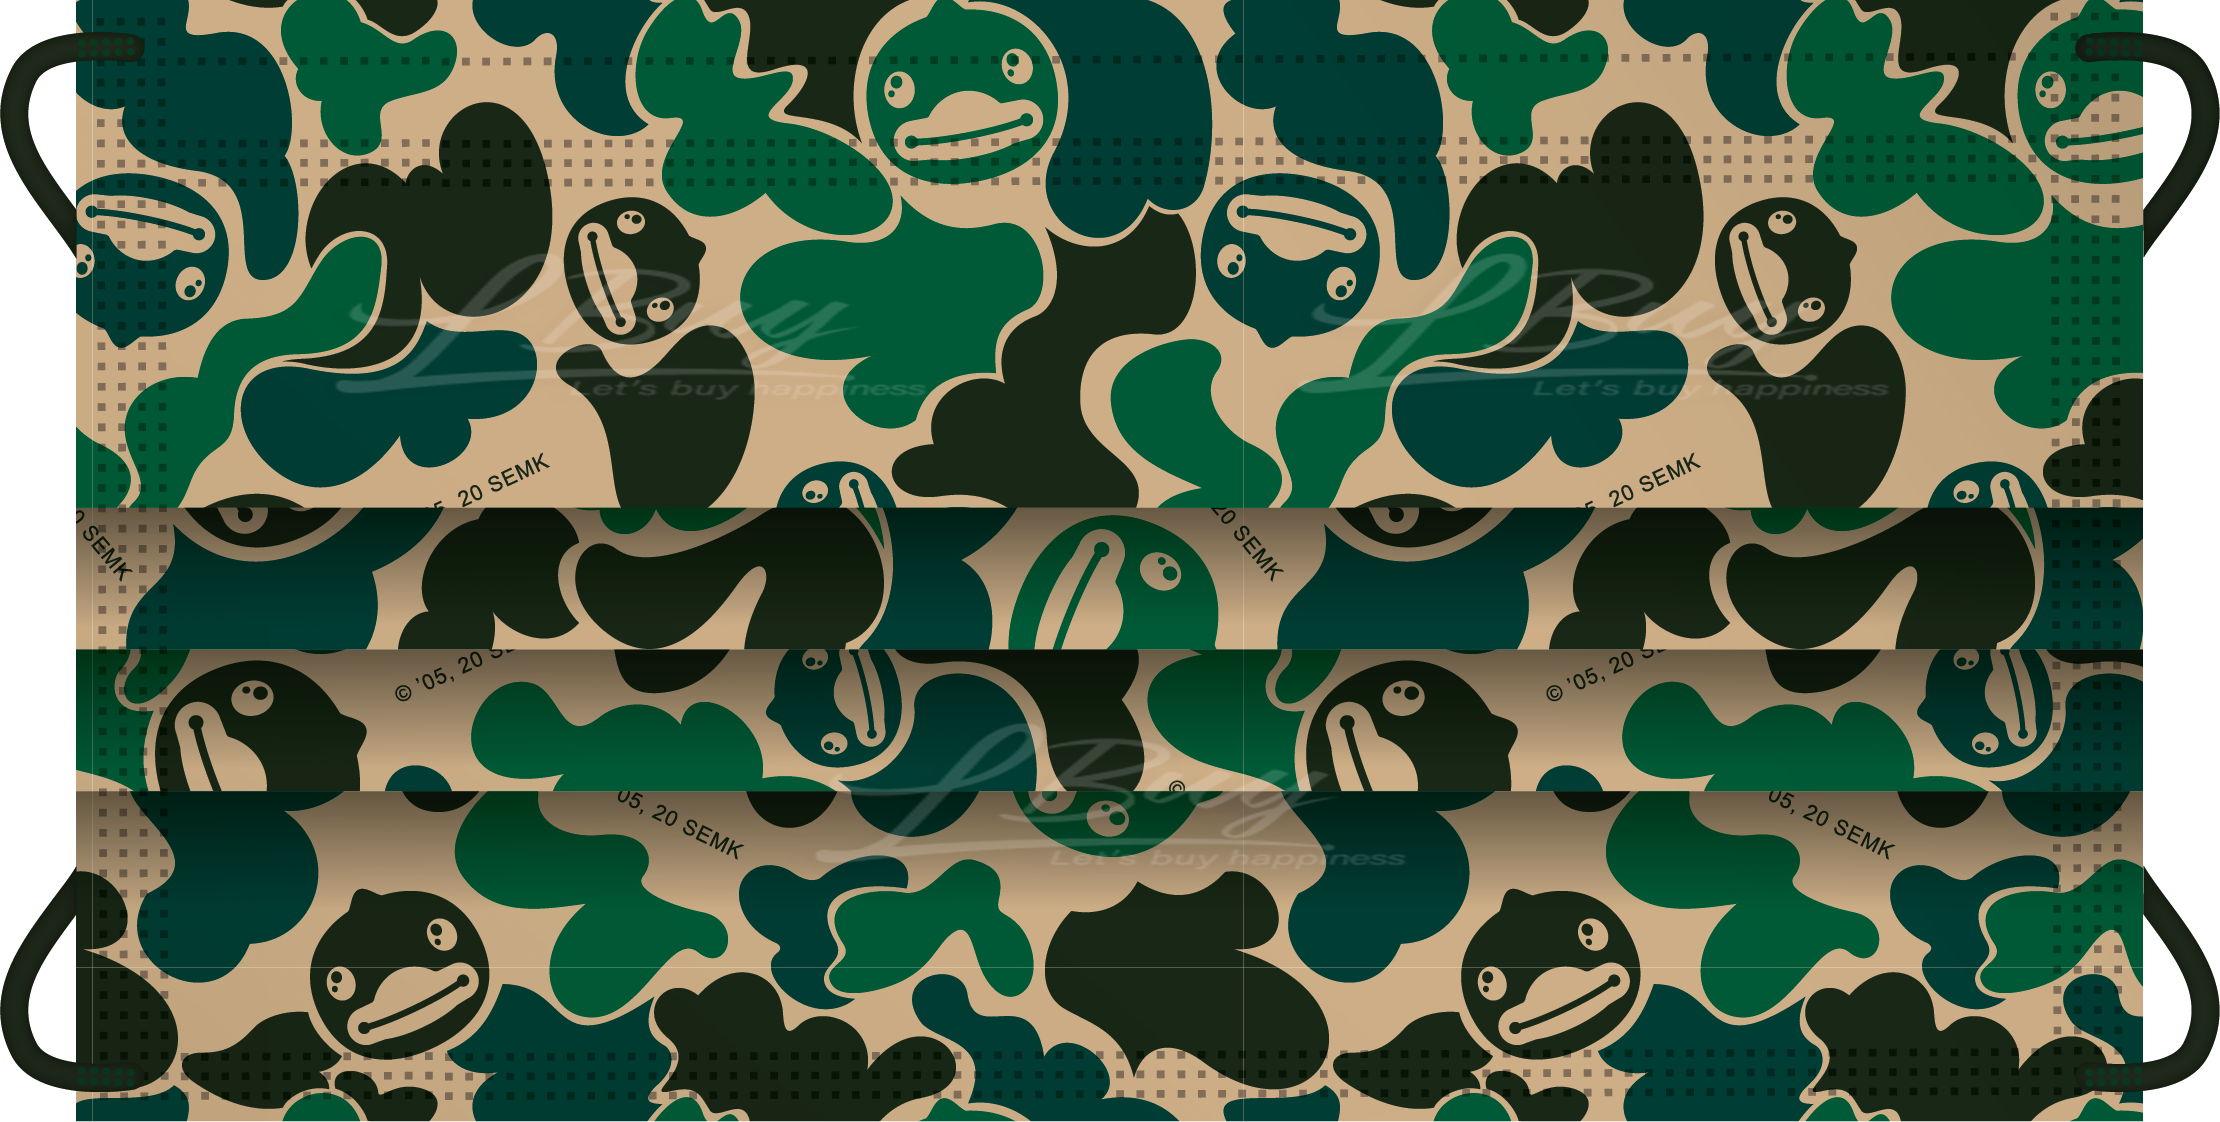 MainettiCare x B. Duck 假日特別版一次性立獨包裝口罩 30片裝